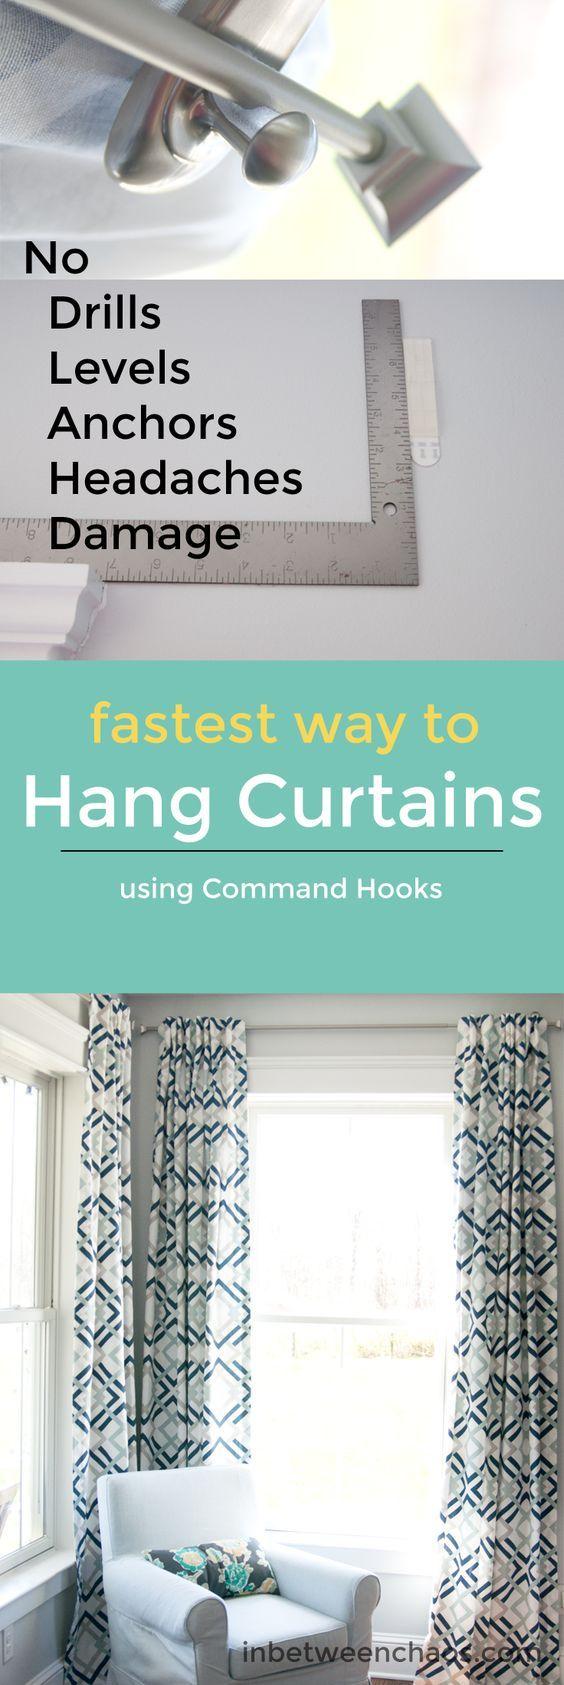 best 25 command hooks ideas on pinterest ikea hack storage hanging storage and ikea bathroom. Black Bedroom Furniture Sets. Home Design Ideas